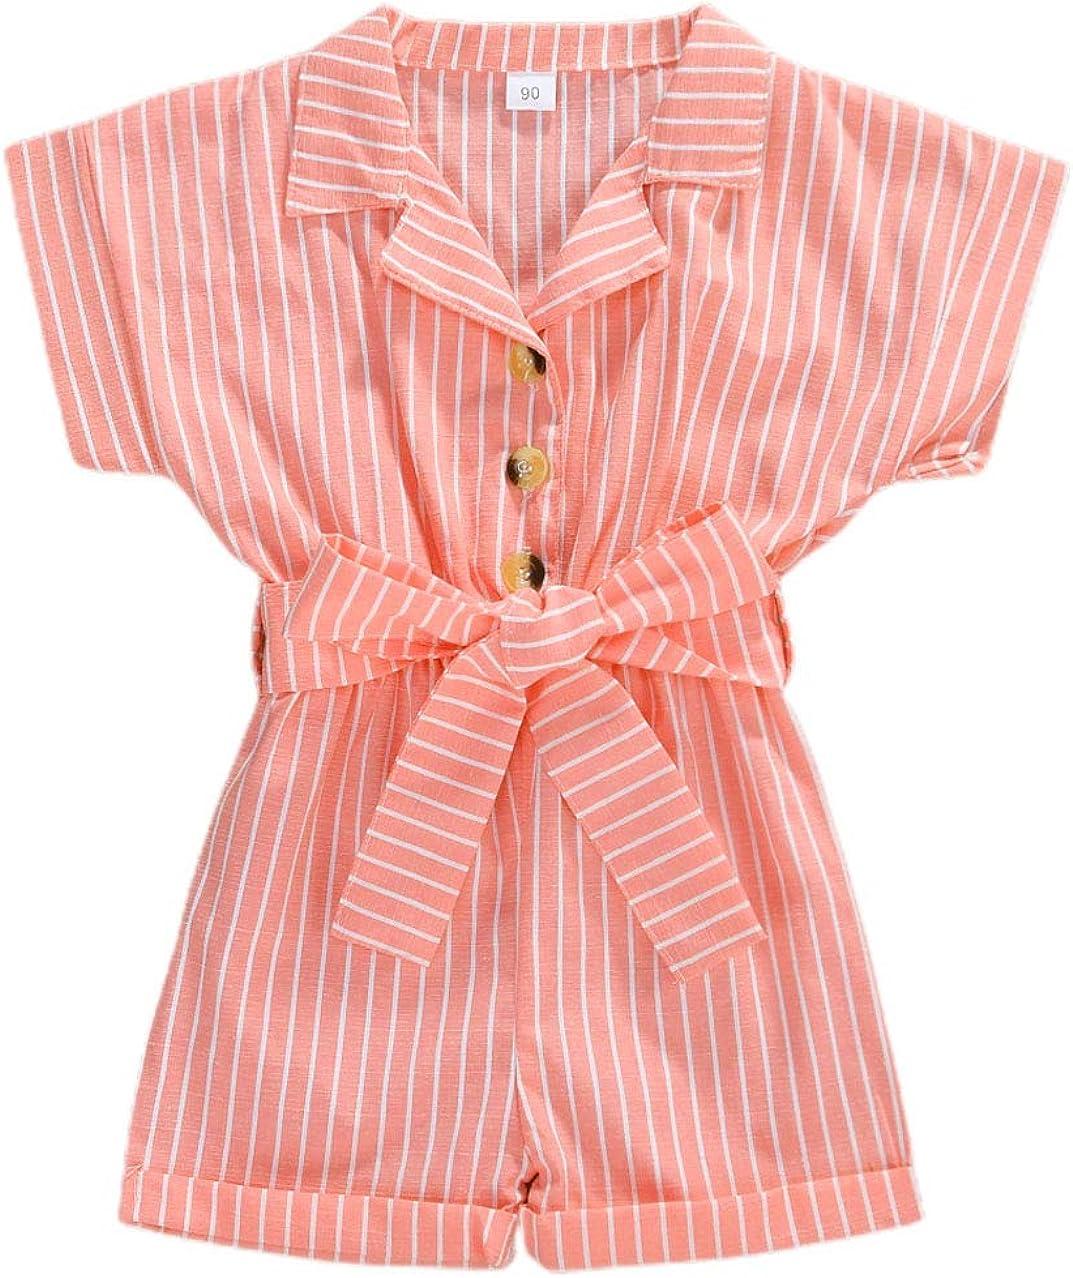 JOJOJUJU Kids Little Girl Short Button Down Sleeve Jumpsu Stripe Popular brand in the Ranking TOP10 world